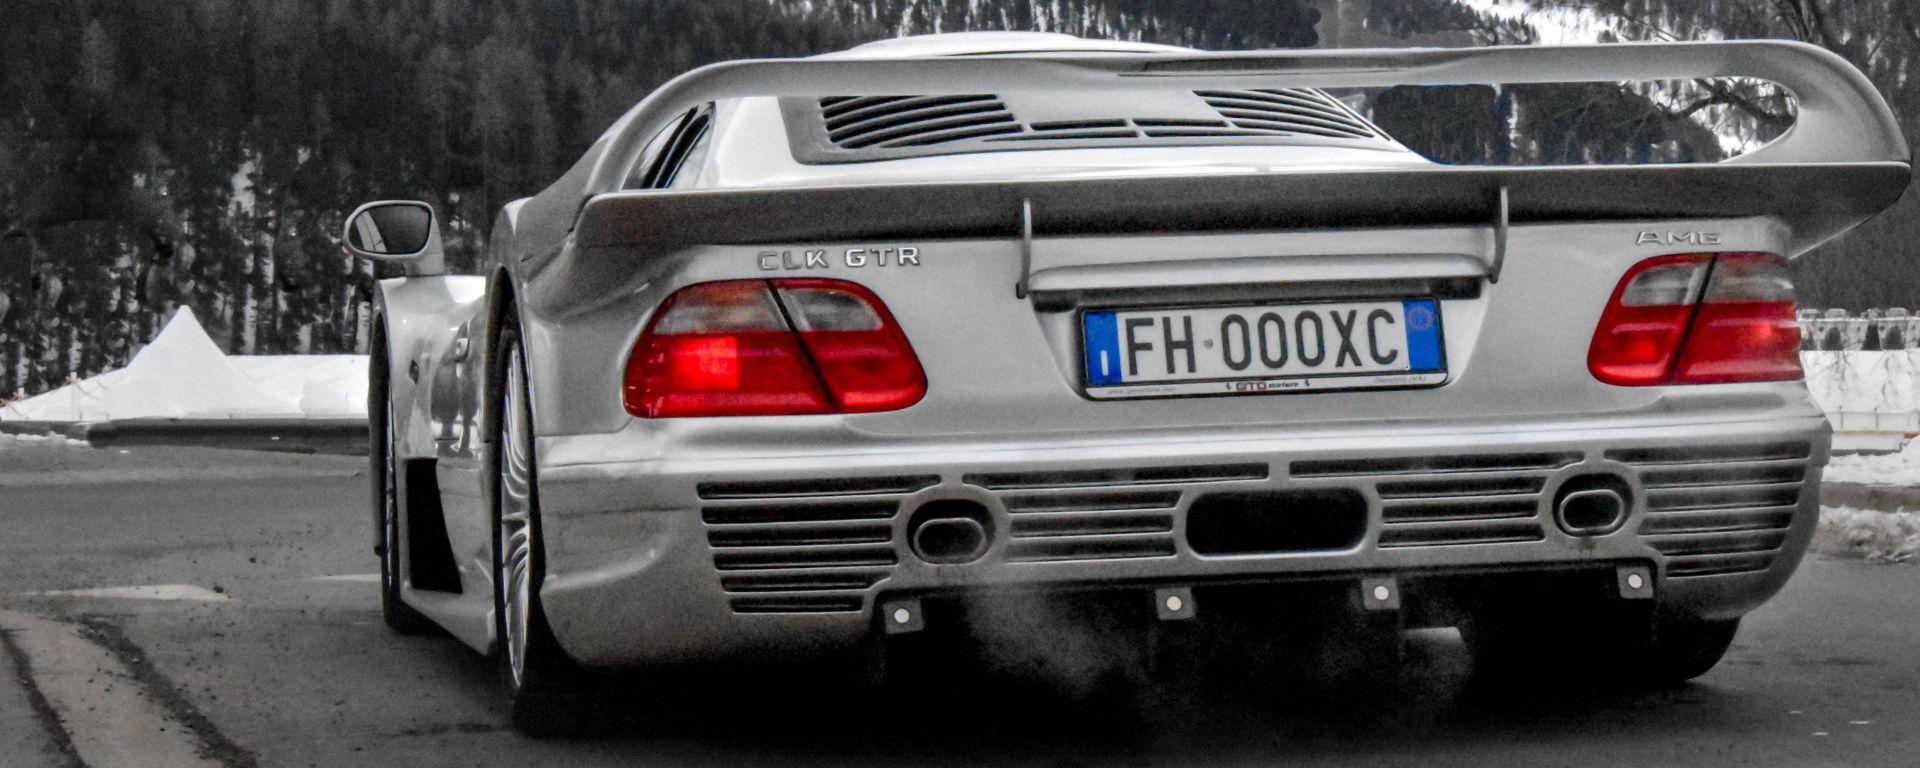 Mercedes CLK-GTR, l'esemplare di Eugenio Amos